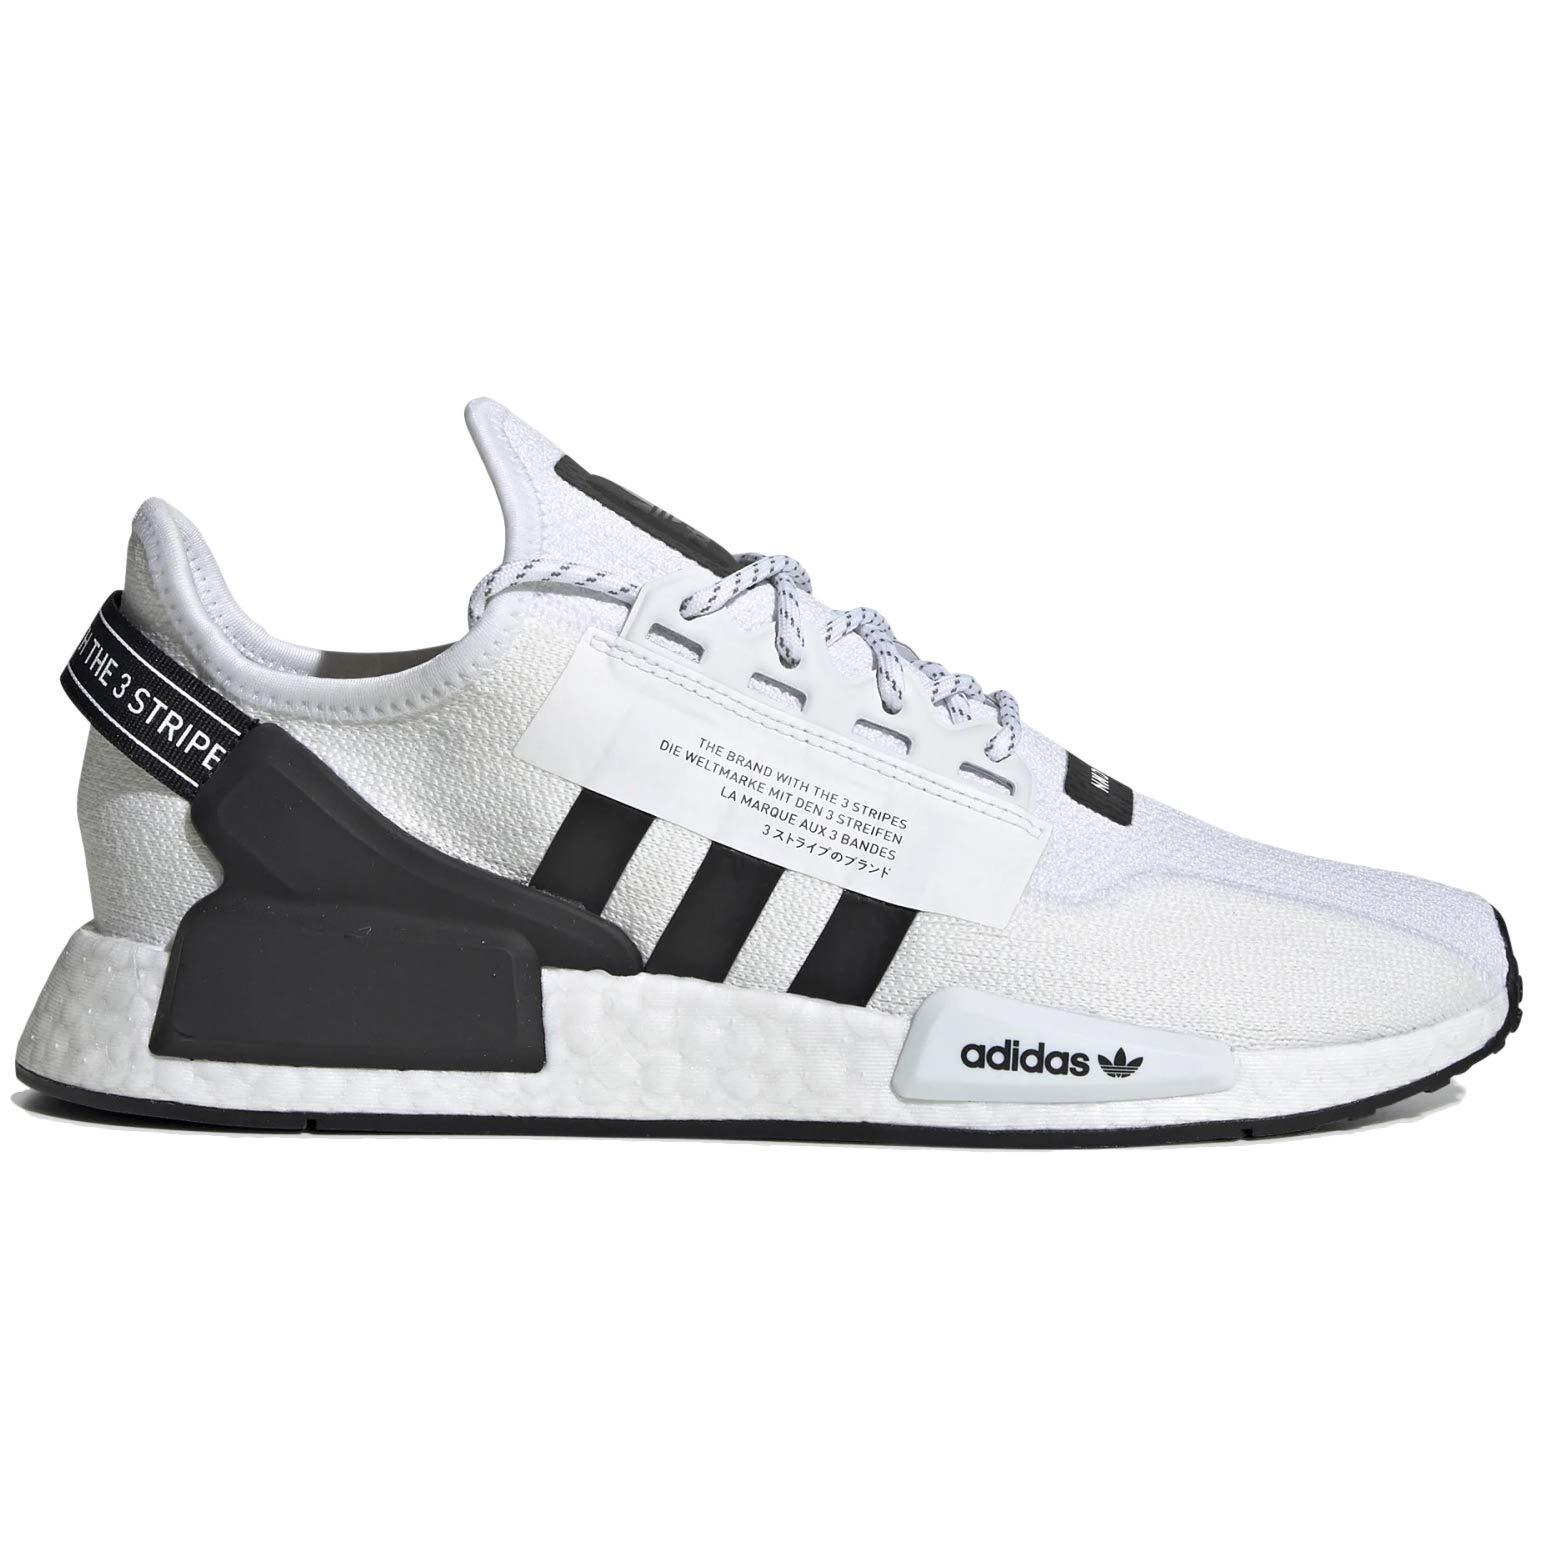 adidas men's nmd r1 black